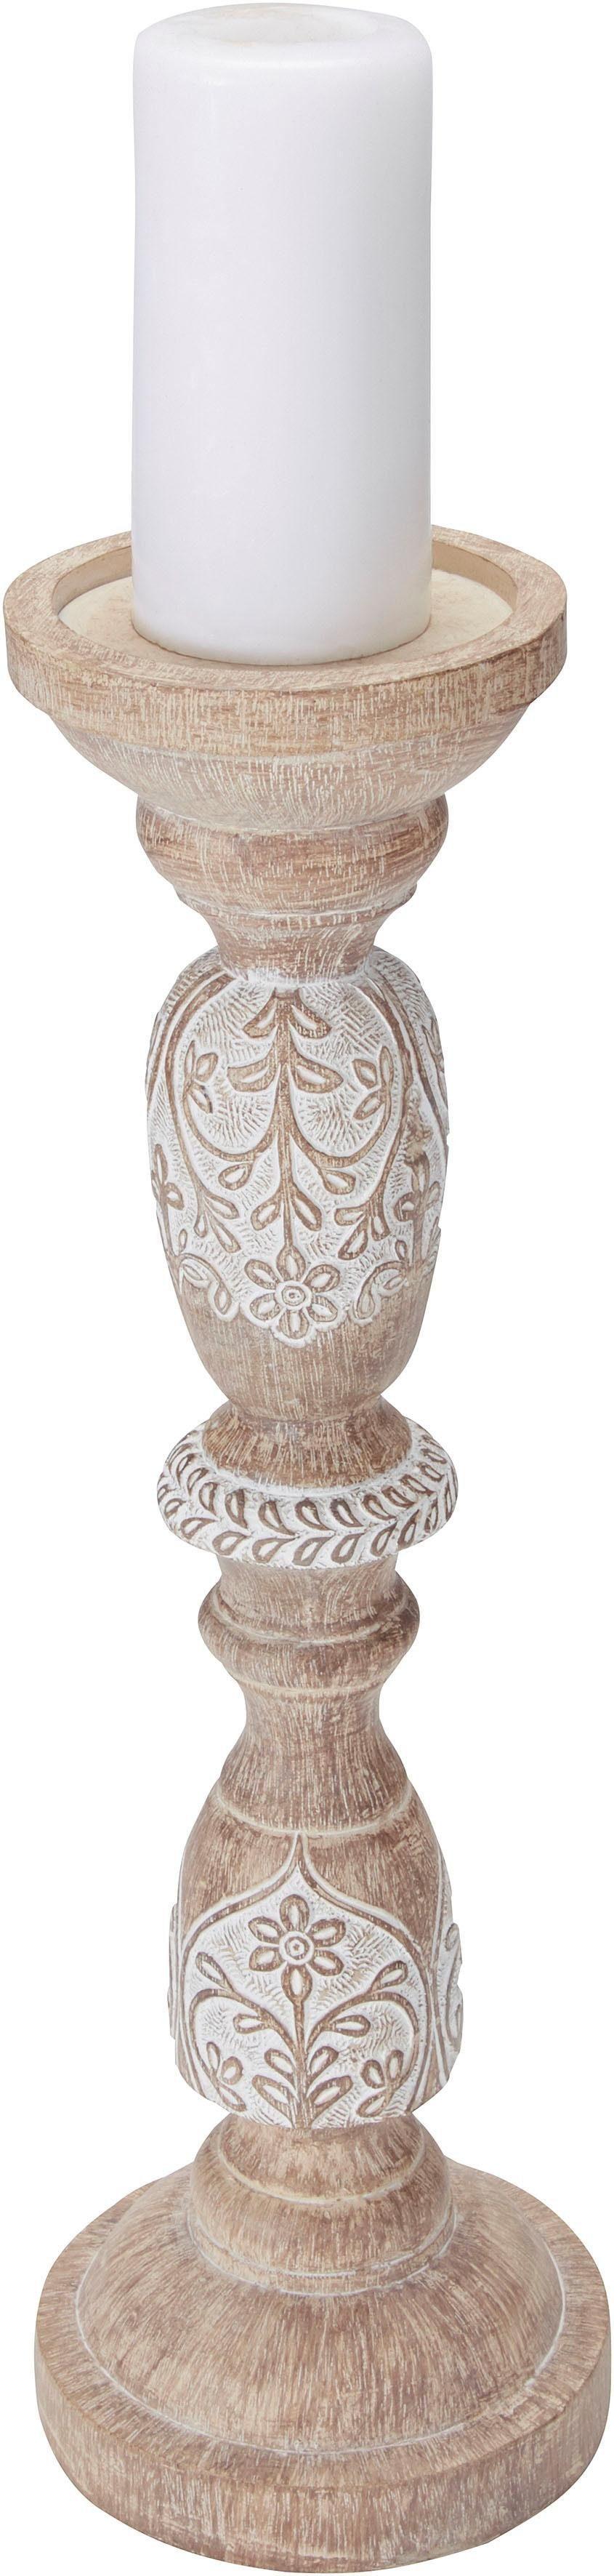 Home affaire Kerzenhalter, im Ethno-Look beige Kerzenhalter Kerzen Laternen Wohnaccessoires